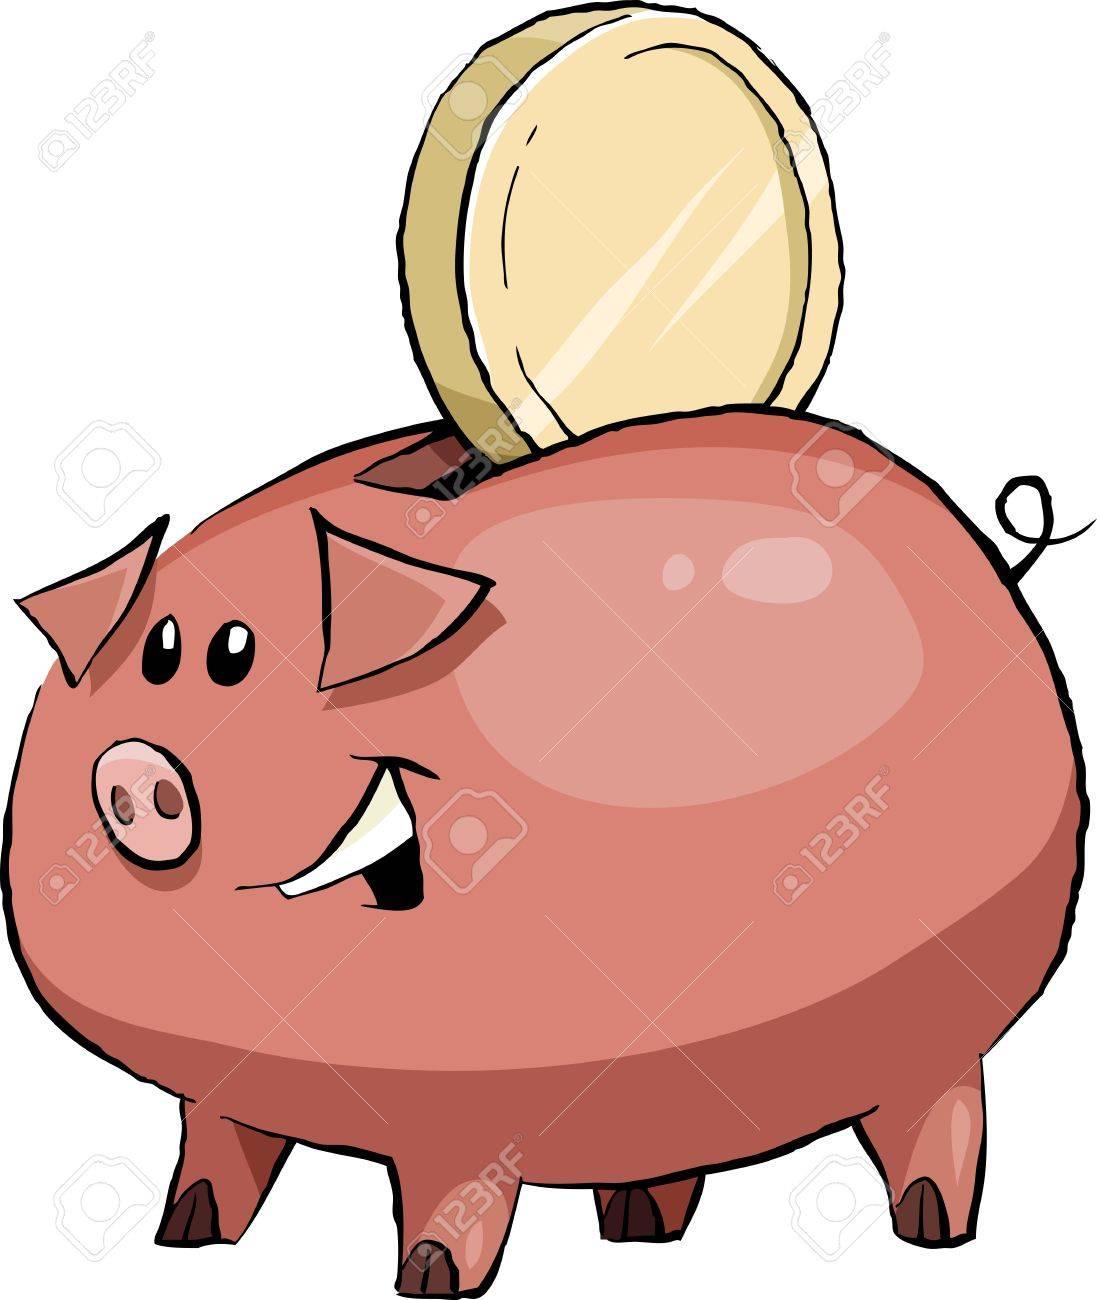 1097x1300 Cartoon Funny Pig Piggy Bank, Vector Illustration Royalty Free